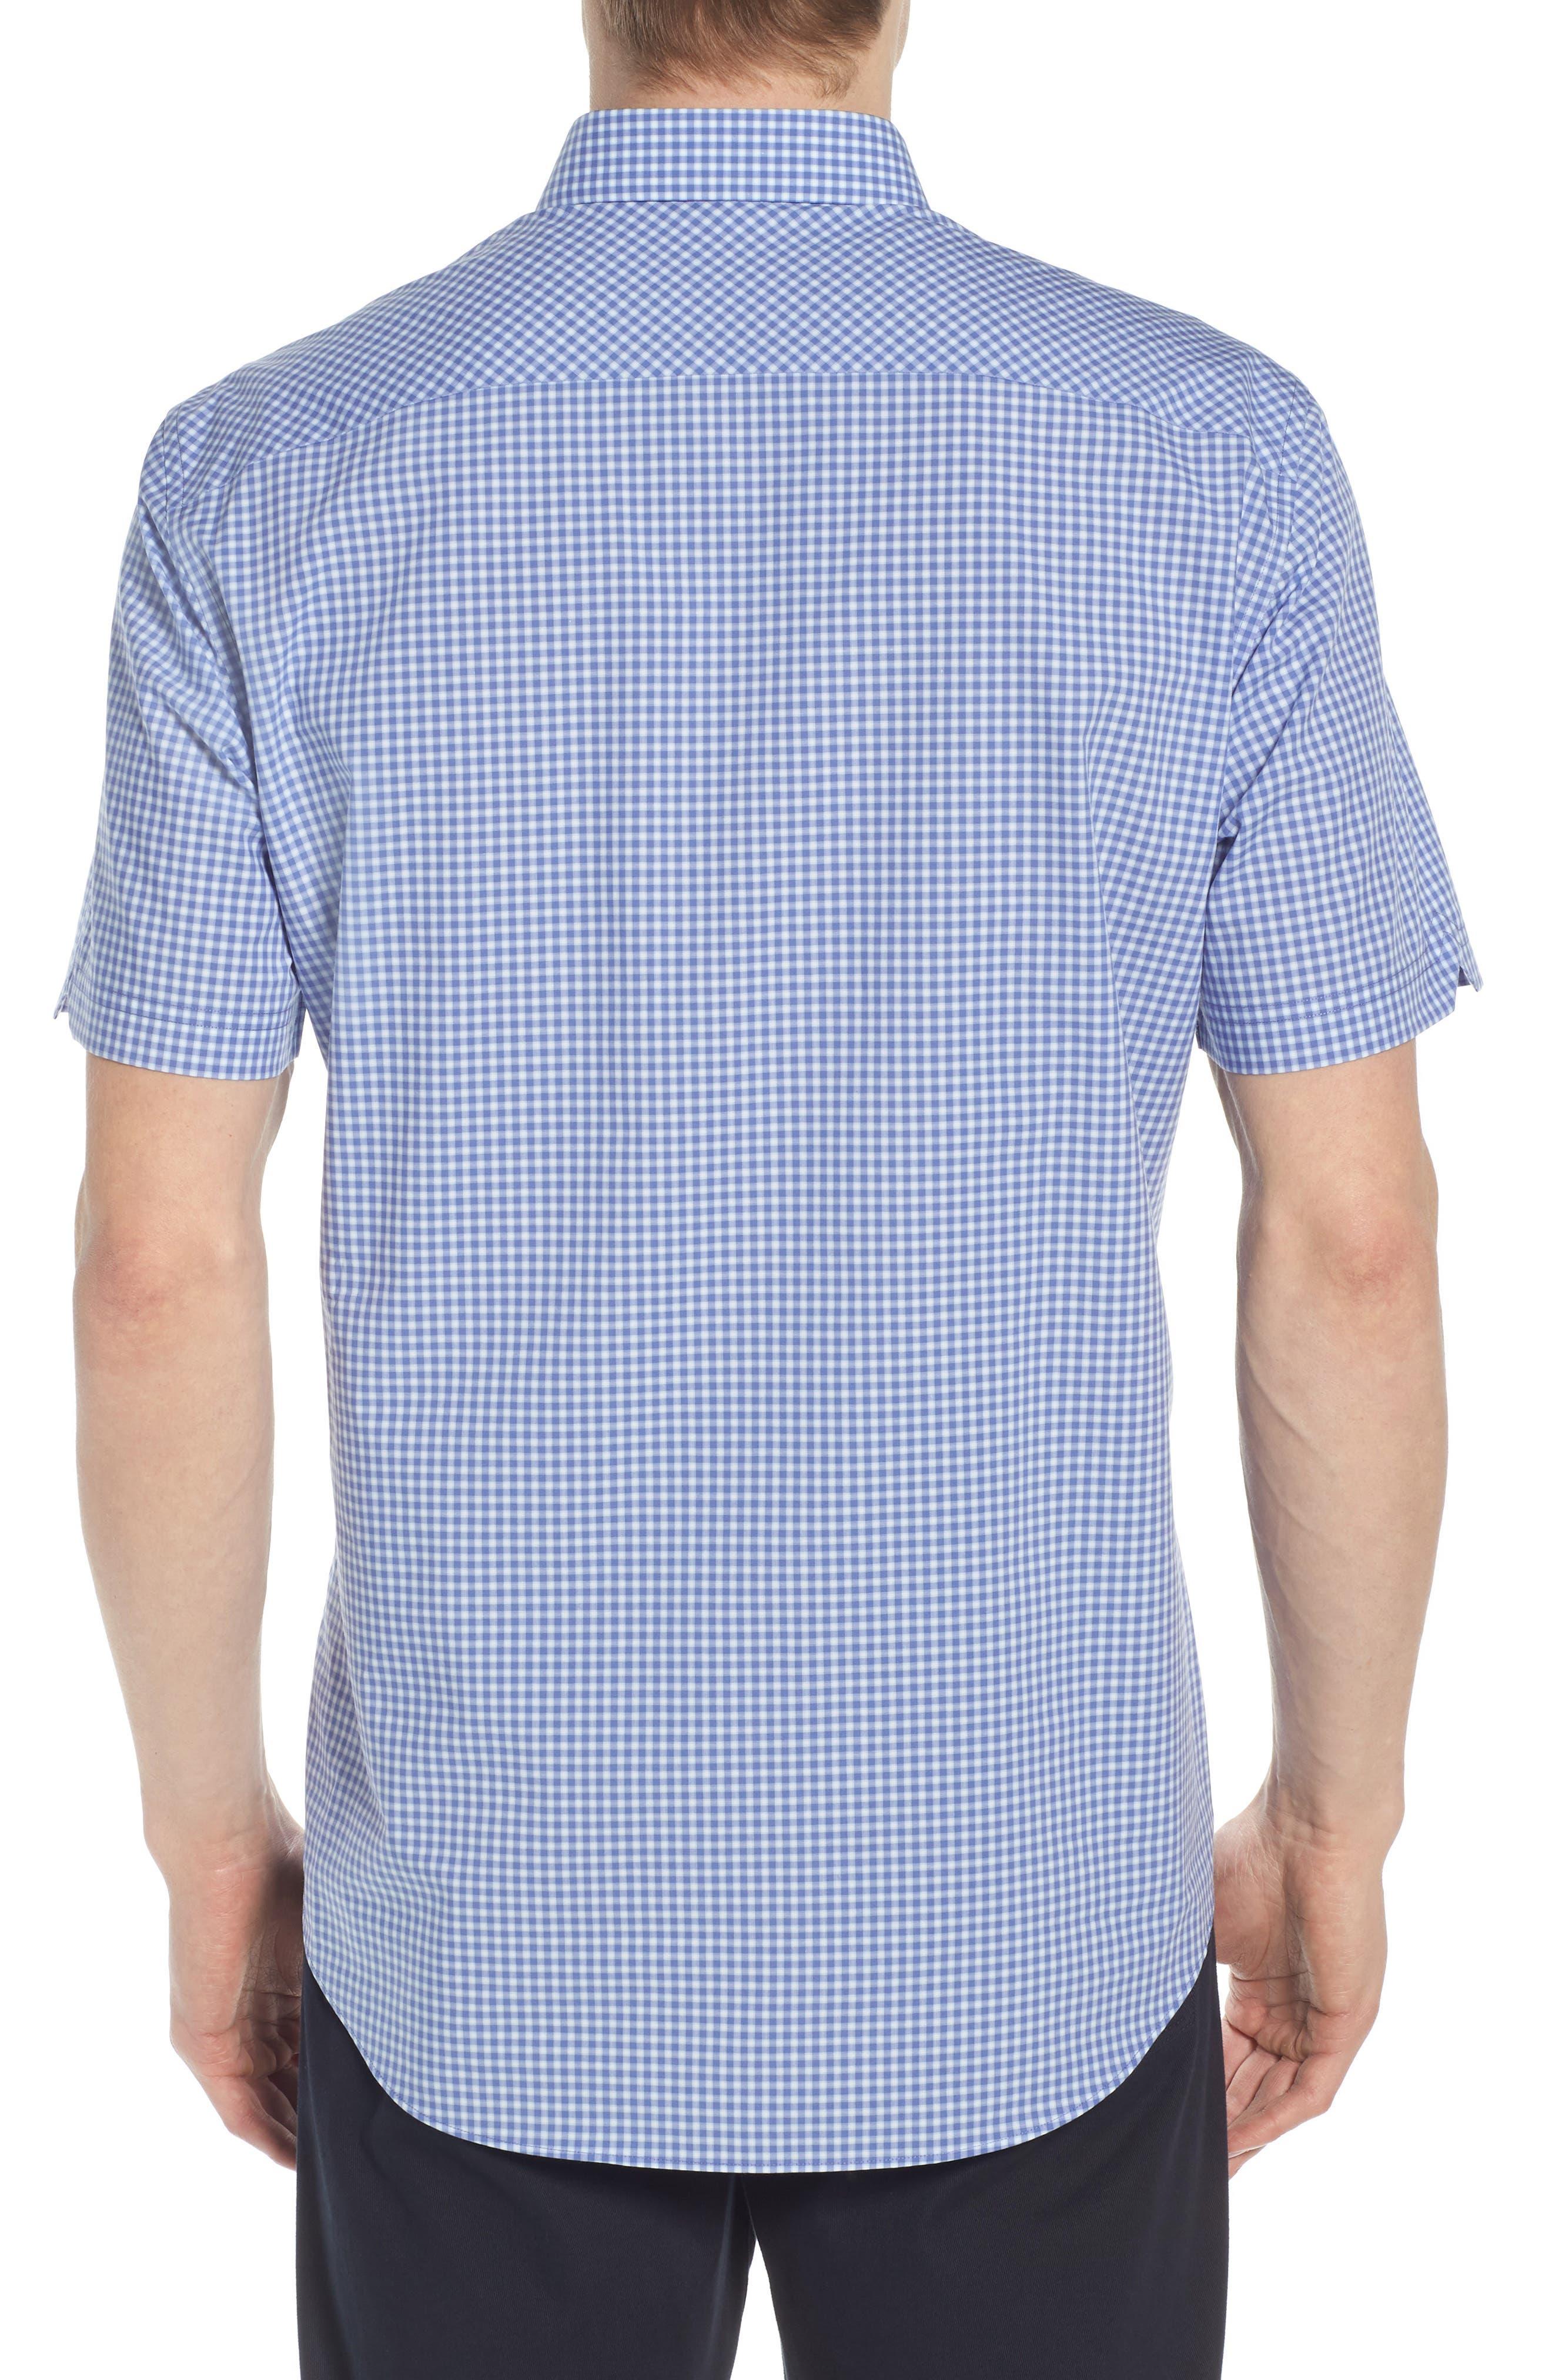 Giovinco Plaid Sport Shirt,                             Alternate thumbnail 2, color,                             422